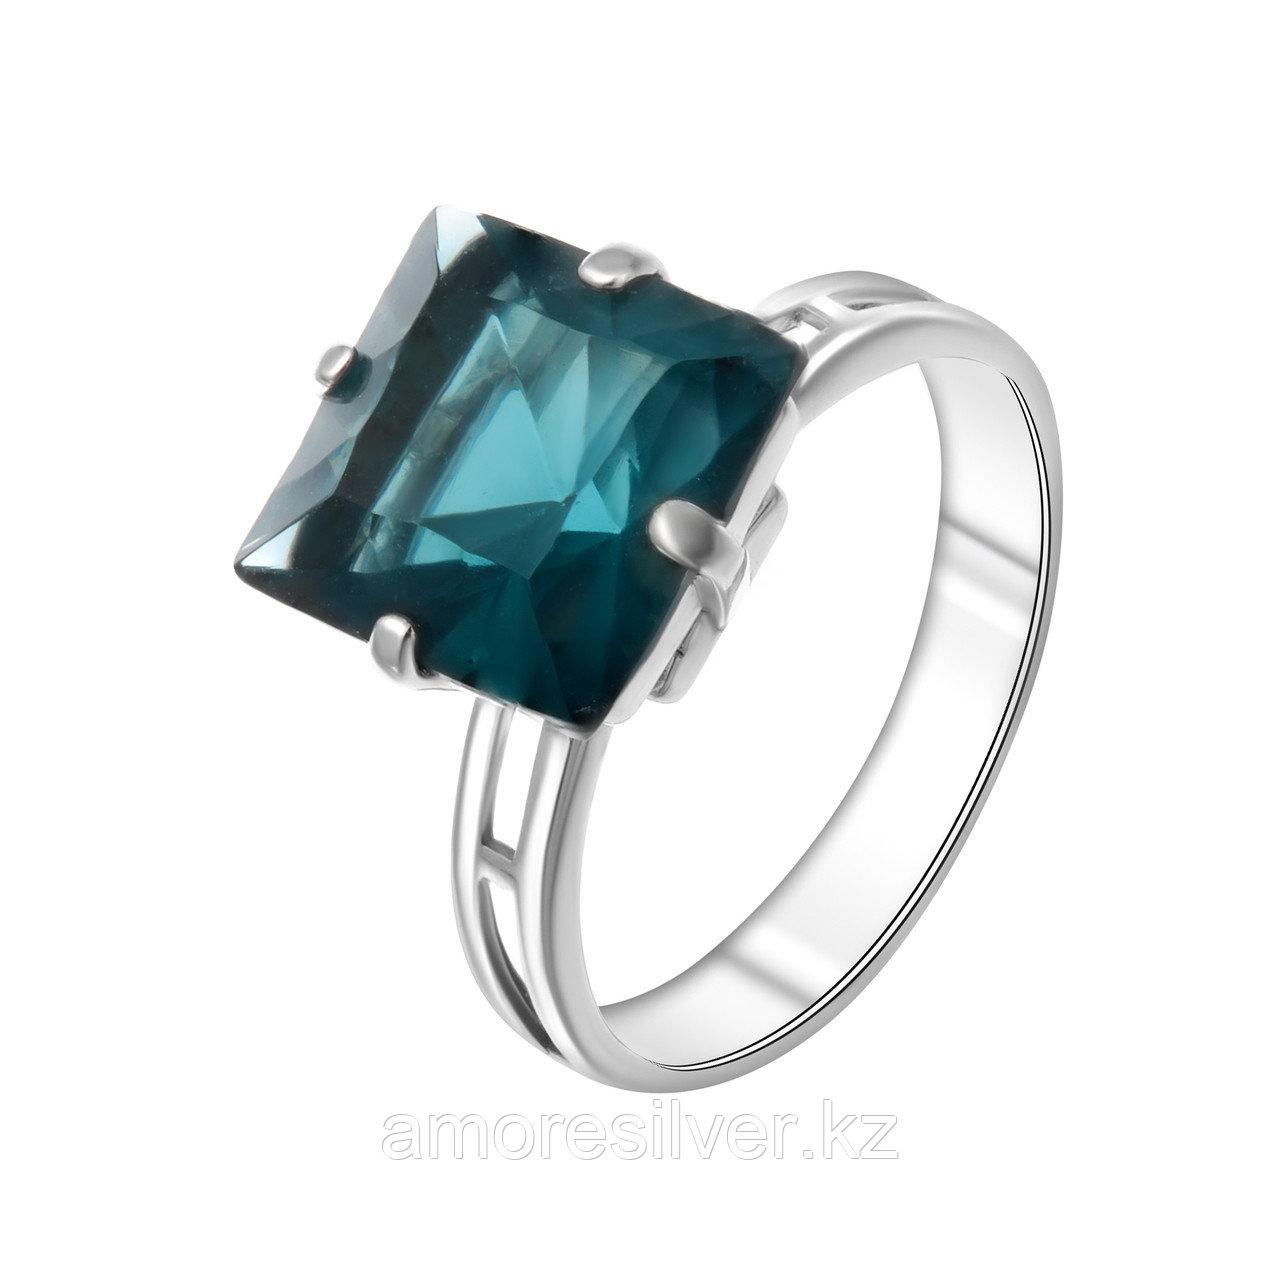 Кольцо Алмаз-Групп серебро с родием, кварц, многокаменка 11390025